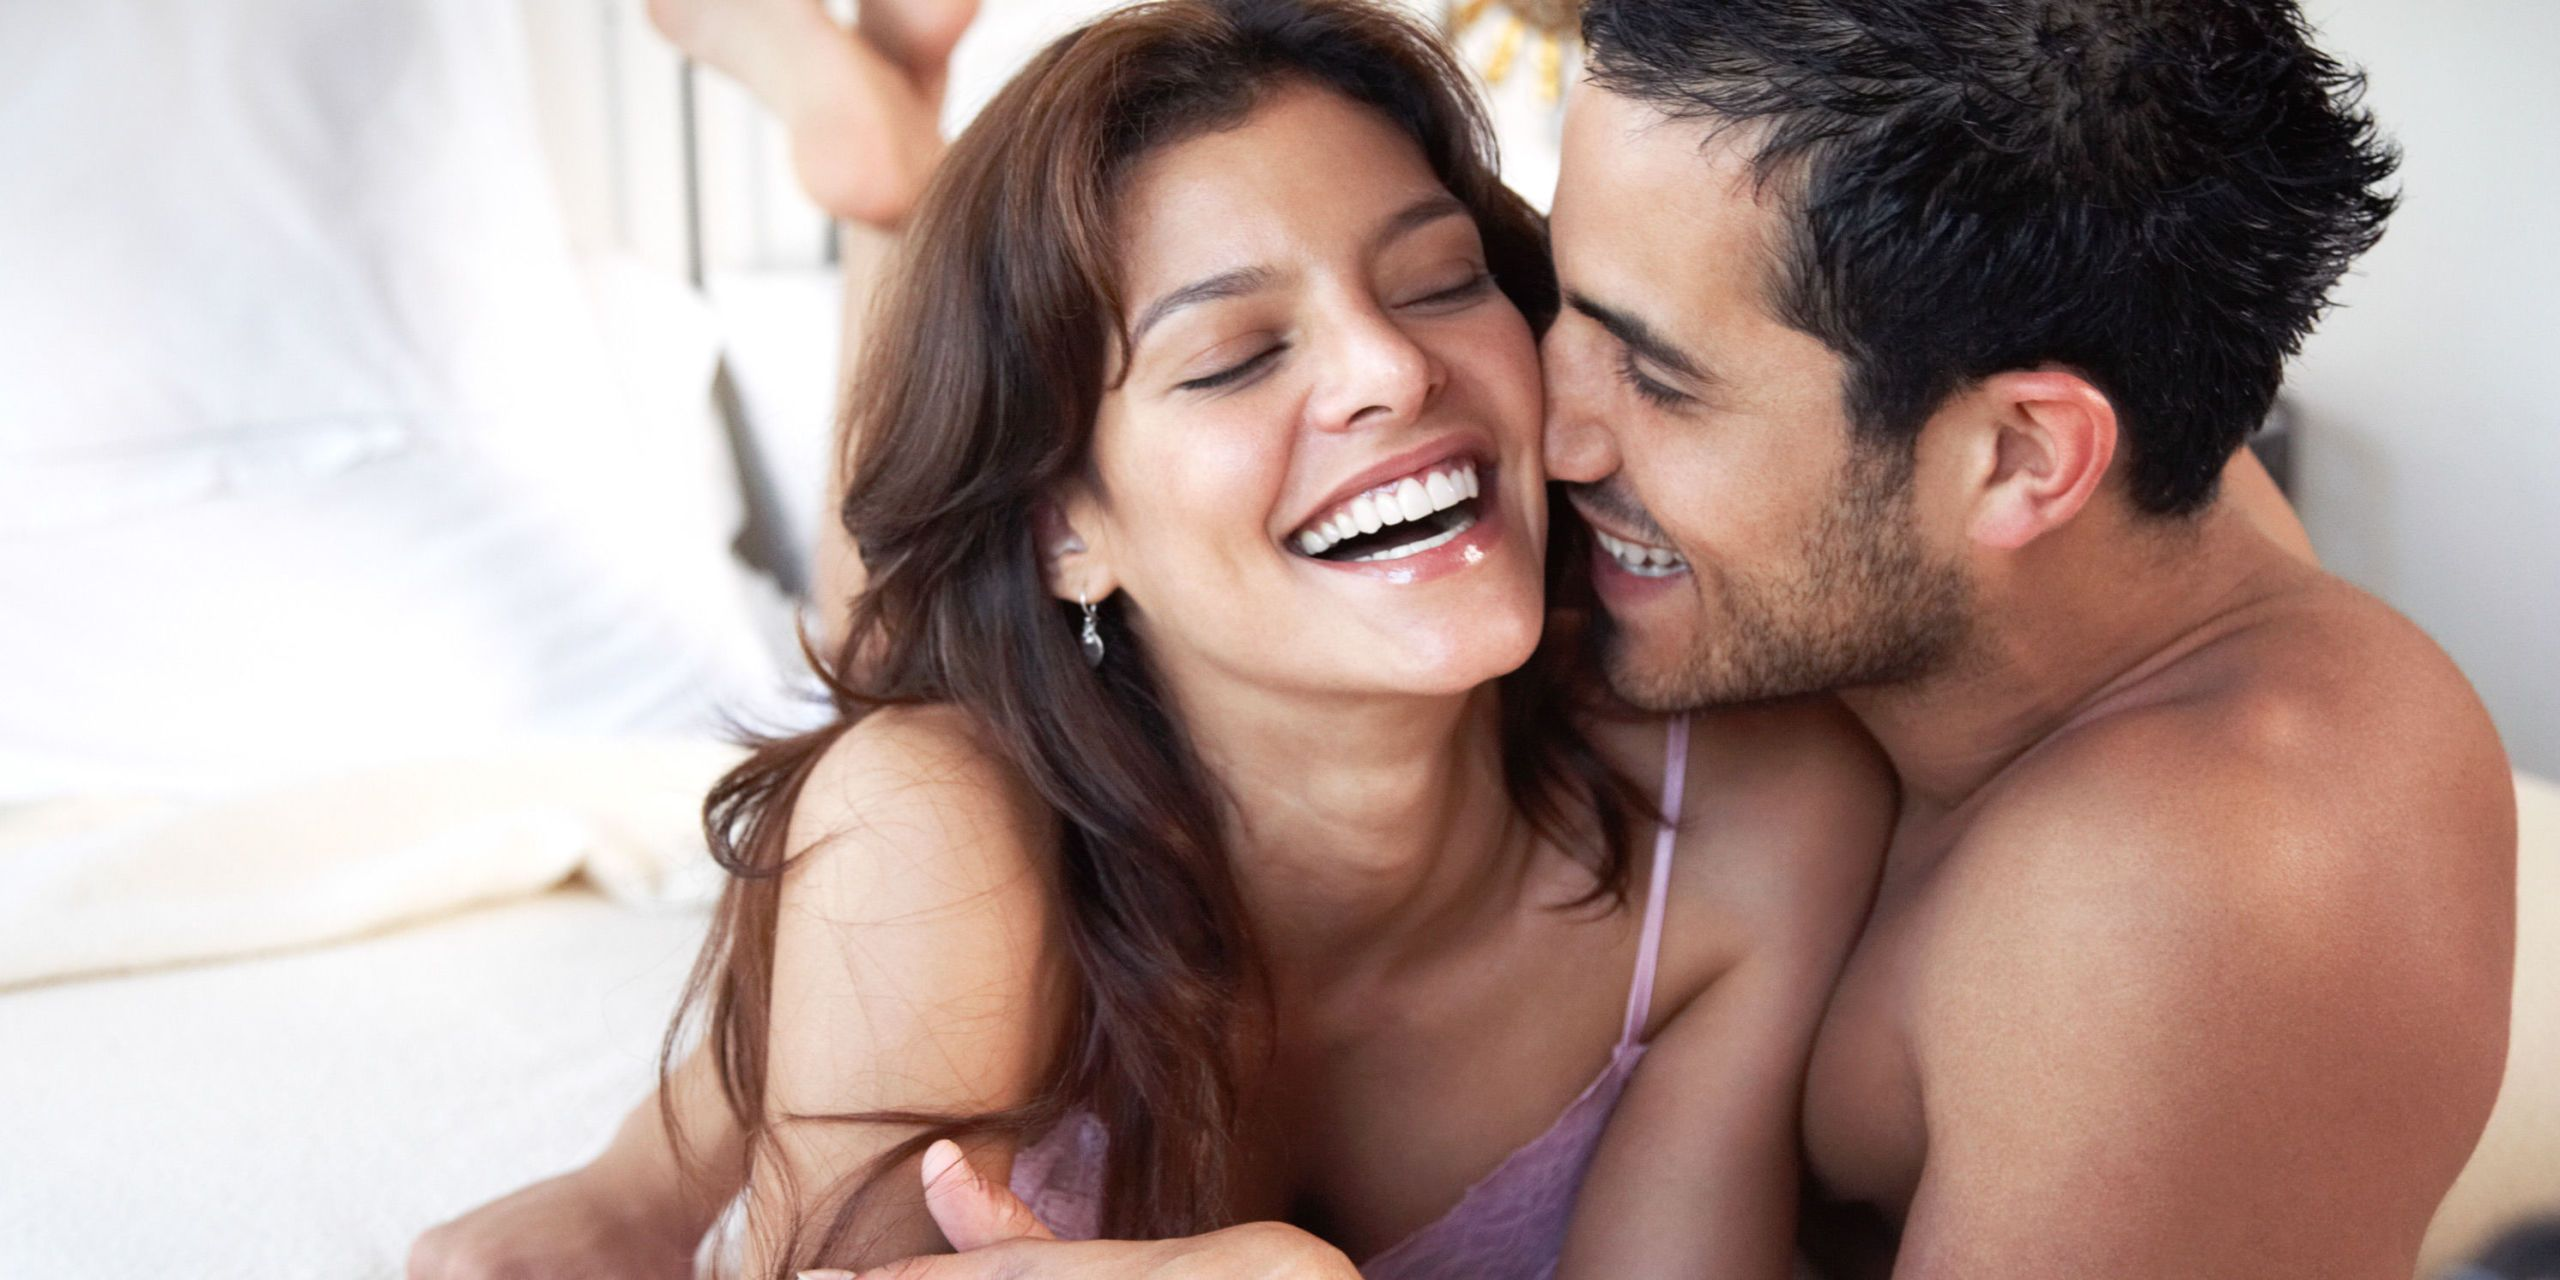 Sounds of men enjoying sex